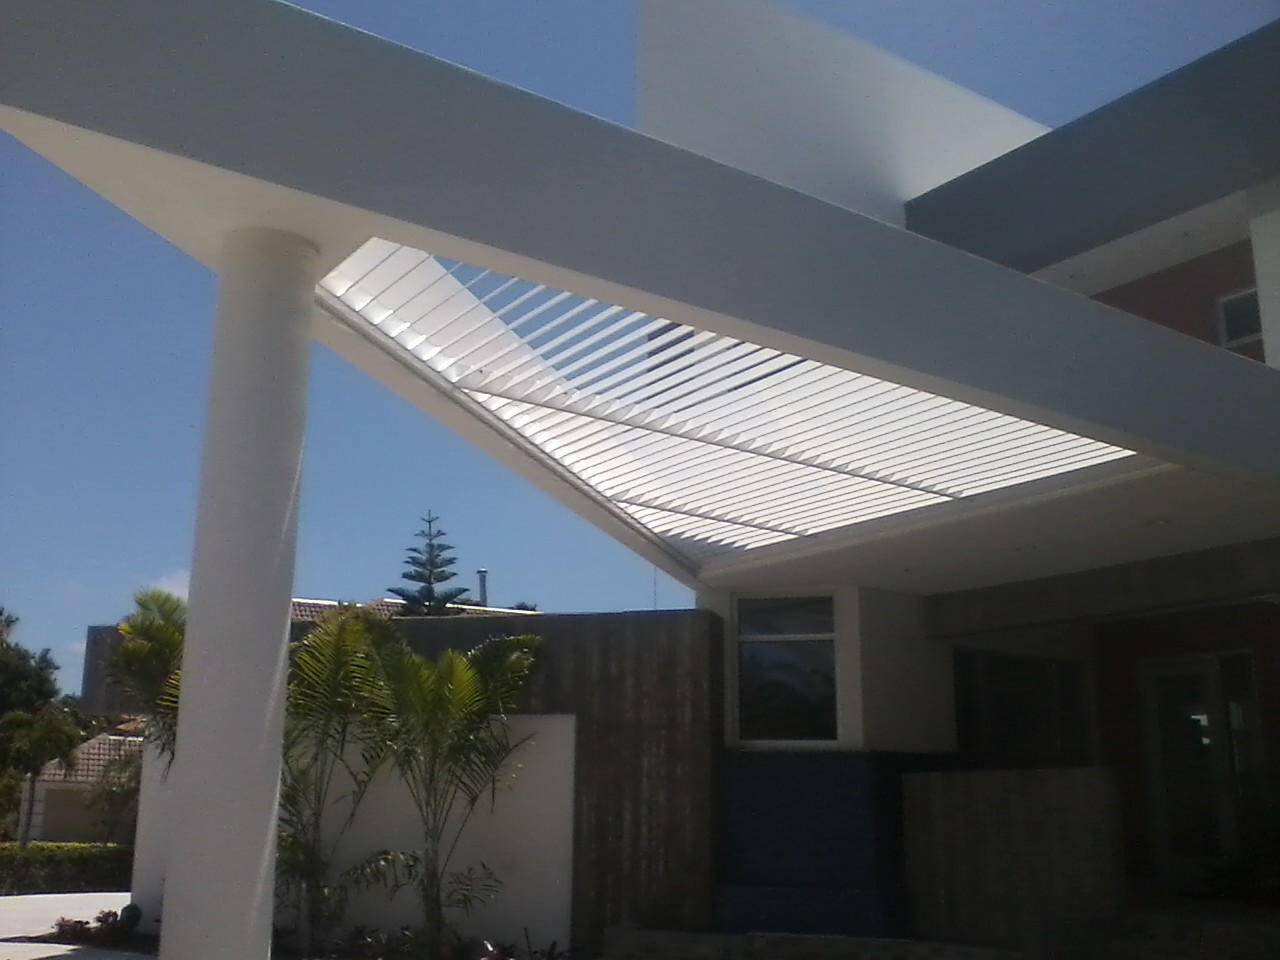 293 Home on Bird Key Driveway Canopy